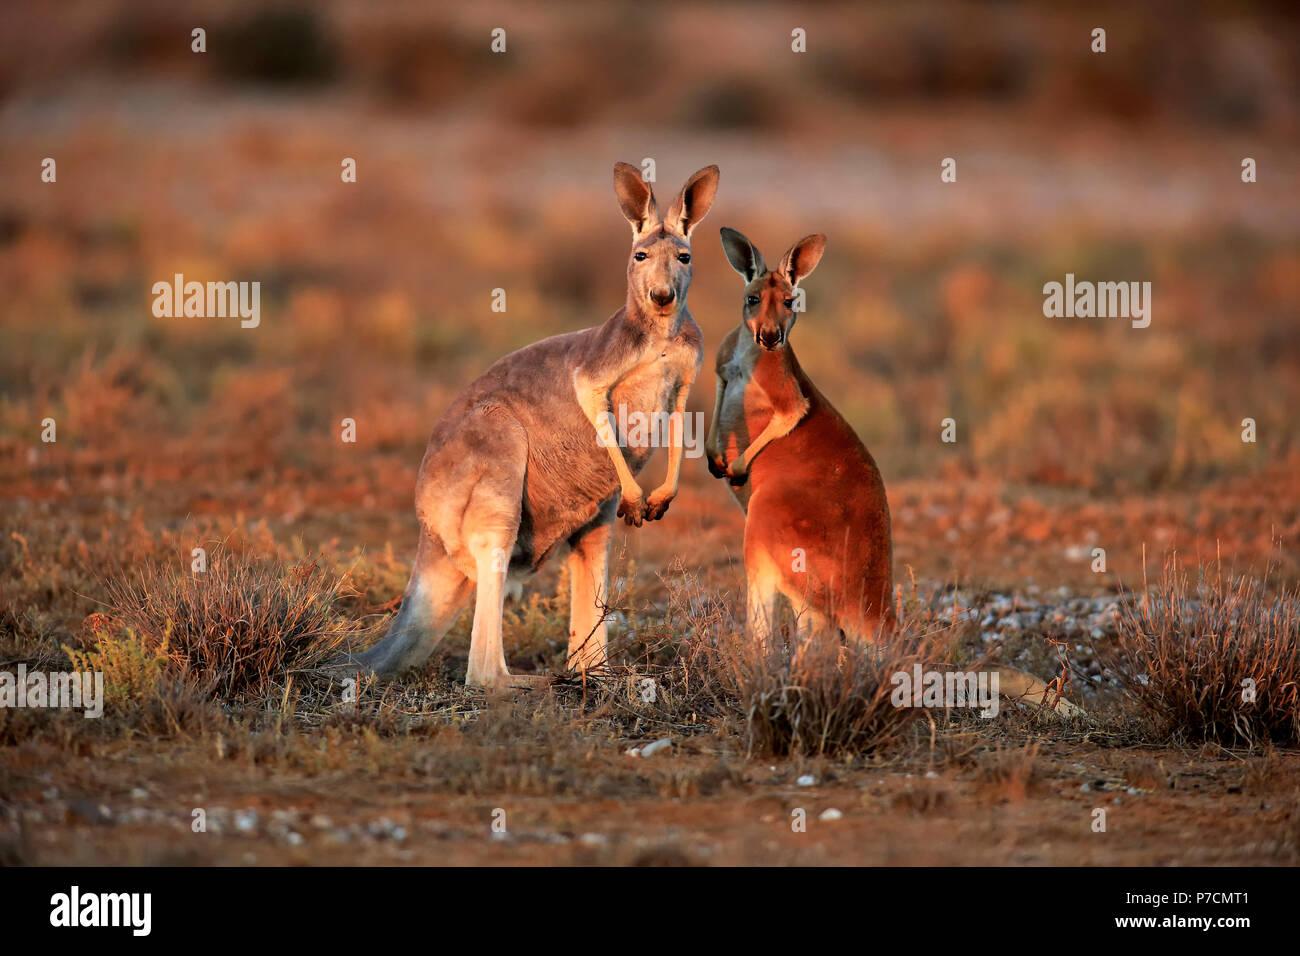 Red Kangaroo, female with subadult, Sturt Nationalpark, New South Wales, Australia, (Macropus rufus) - Stock Image